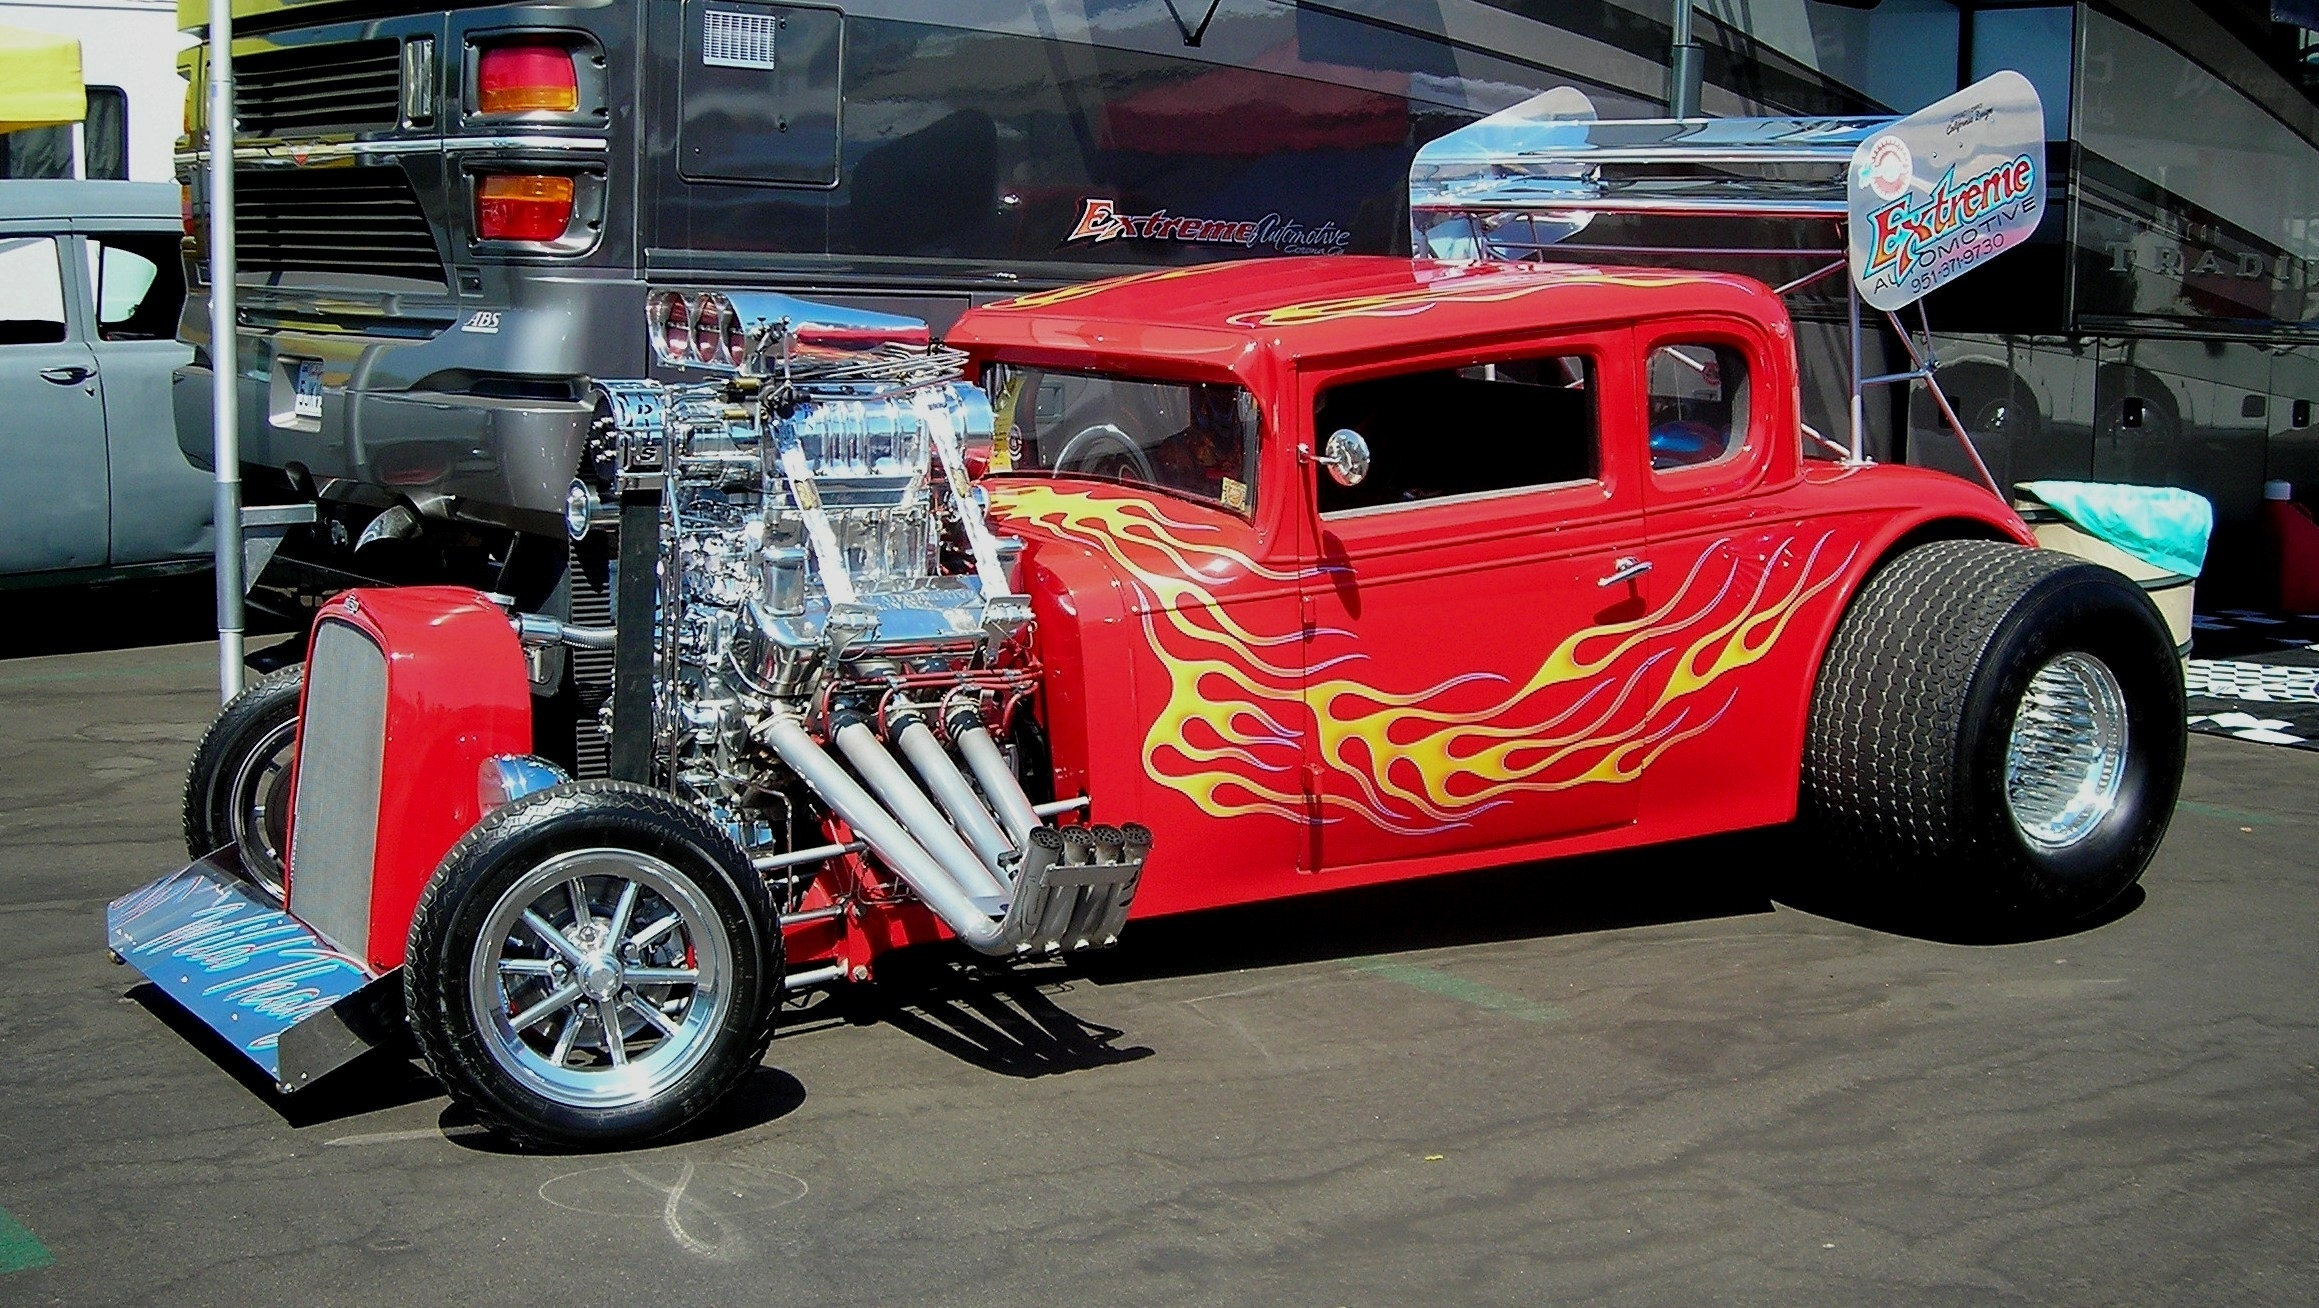 Vehicles Cars Custom Engine Chrome Hot Rod Classic Old